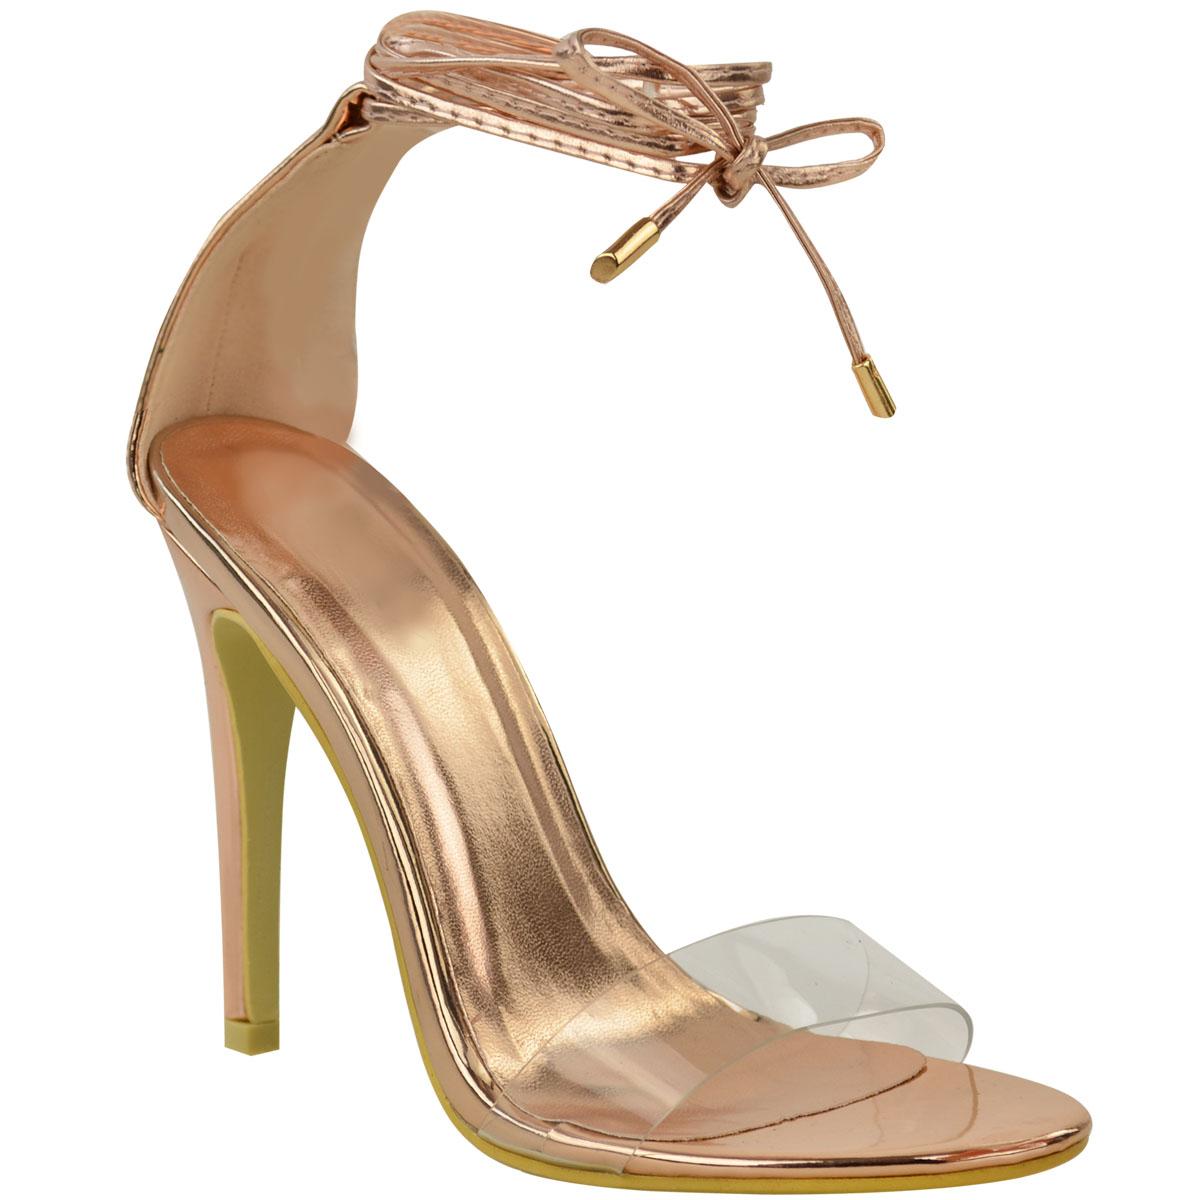 New Womens Ladies High Heel Perspex Ankle Strappy Celeb